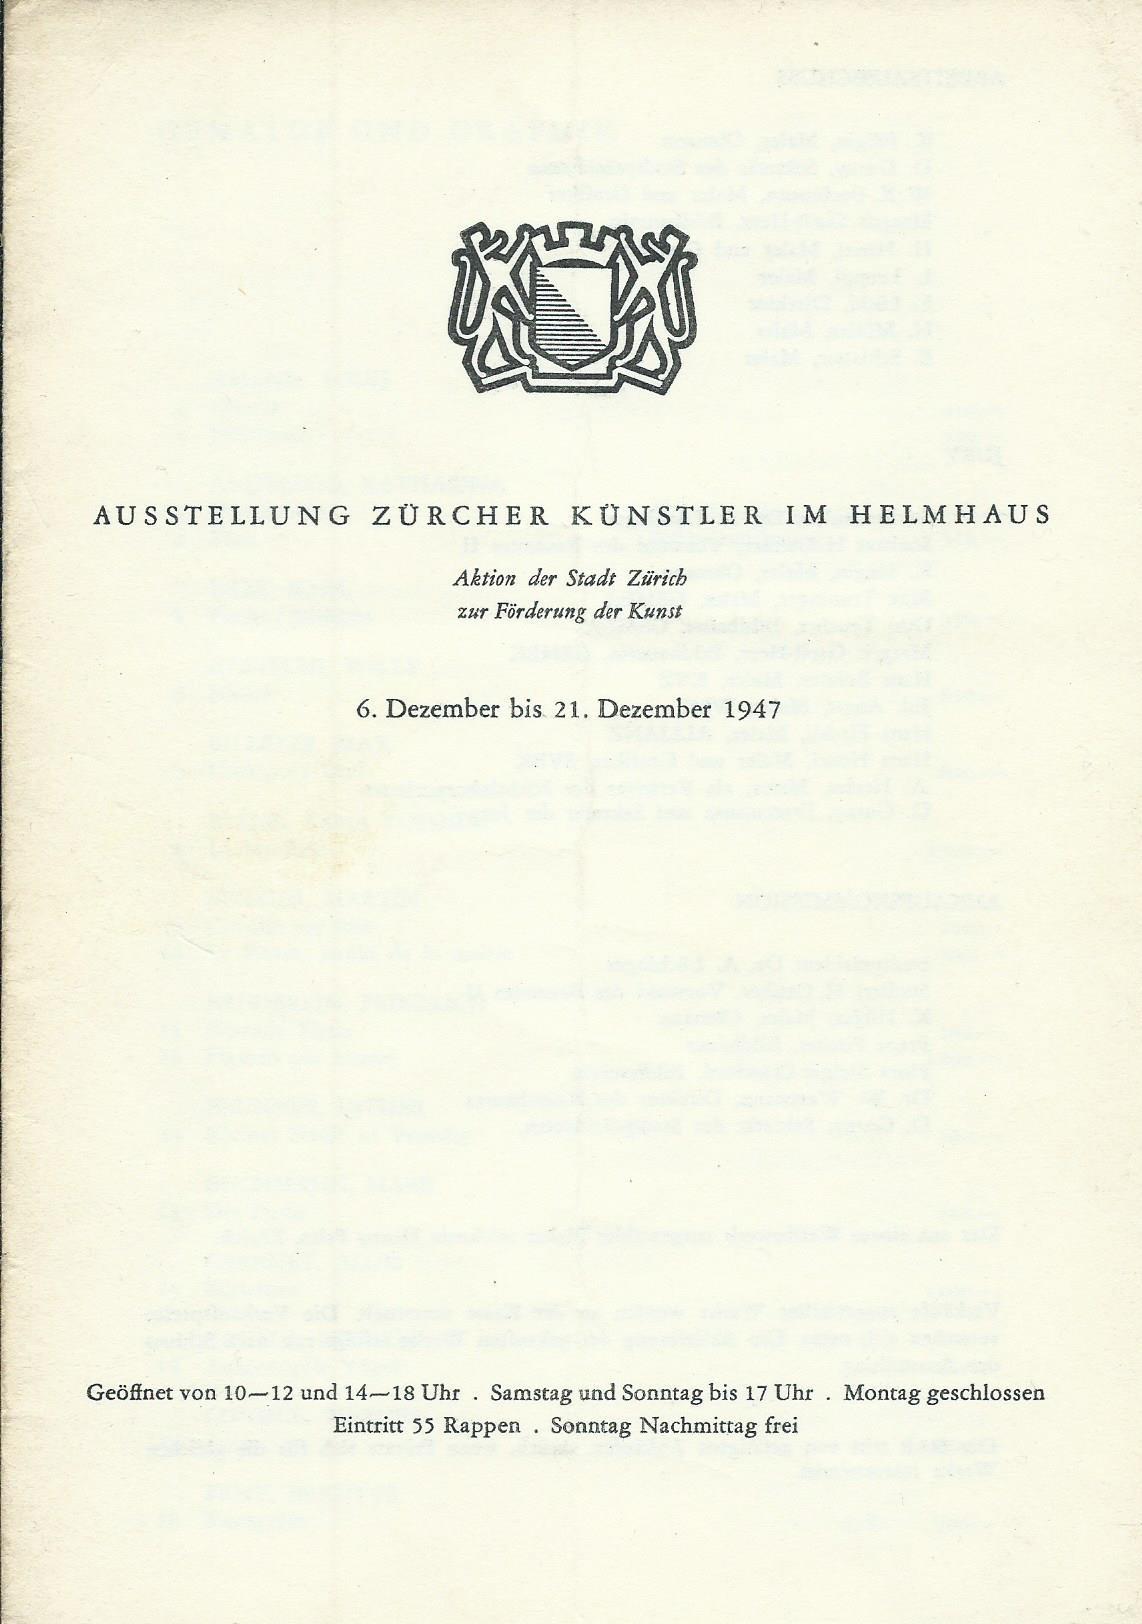 Ausstellung Zürcher Künstler im Helmhaus, 6. Dezember: Stadt Zürich, Hrsg.